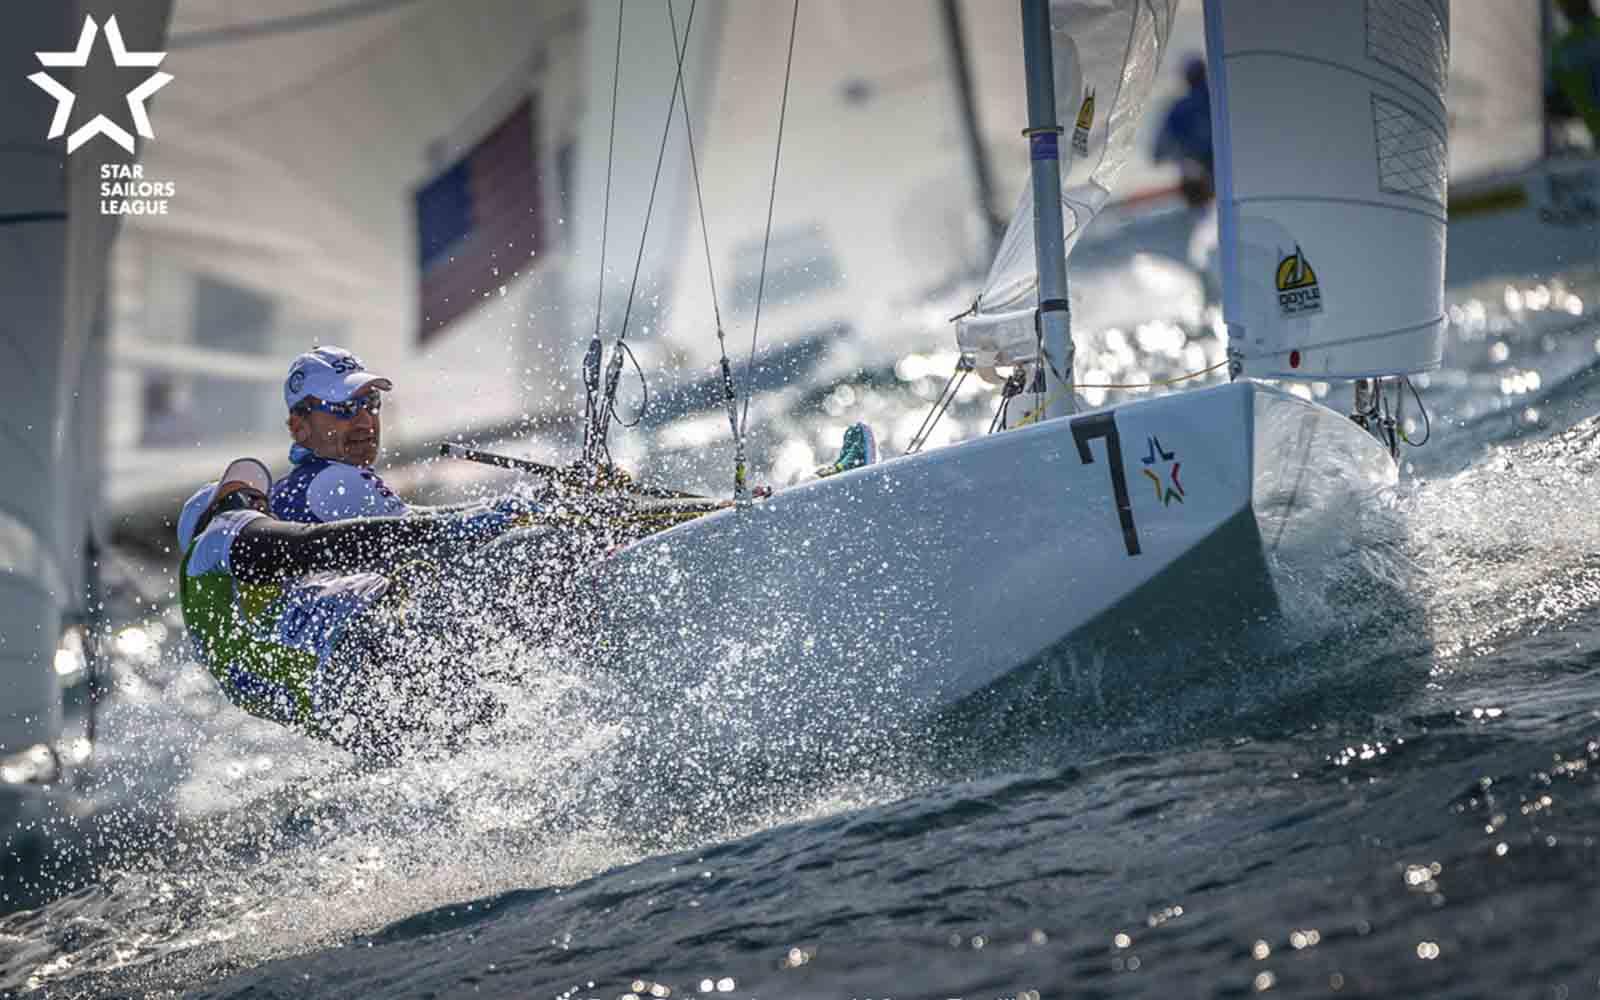 Paul Cayard e Arthur Lopes (Marc Rouiller SSL) - boat shopping